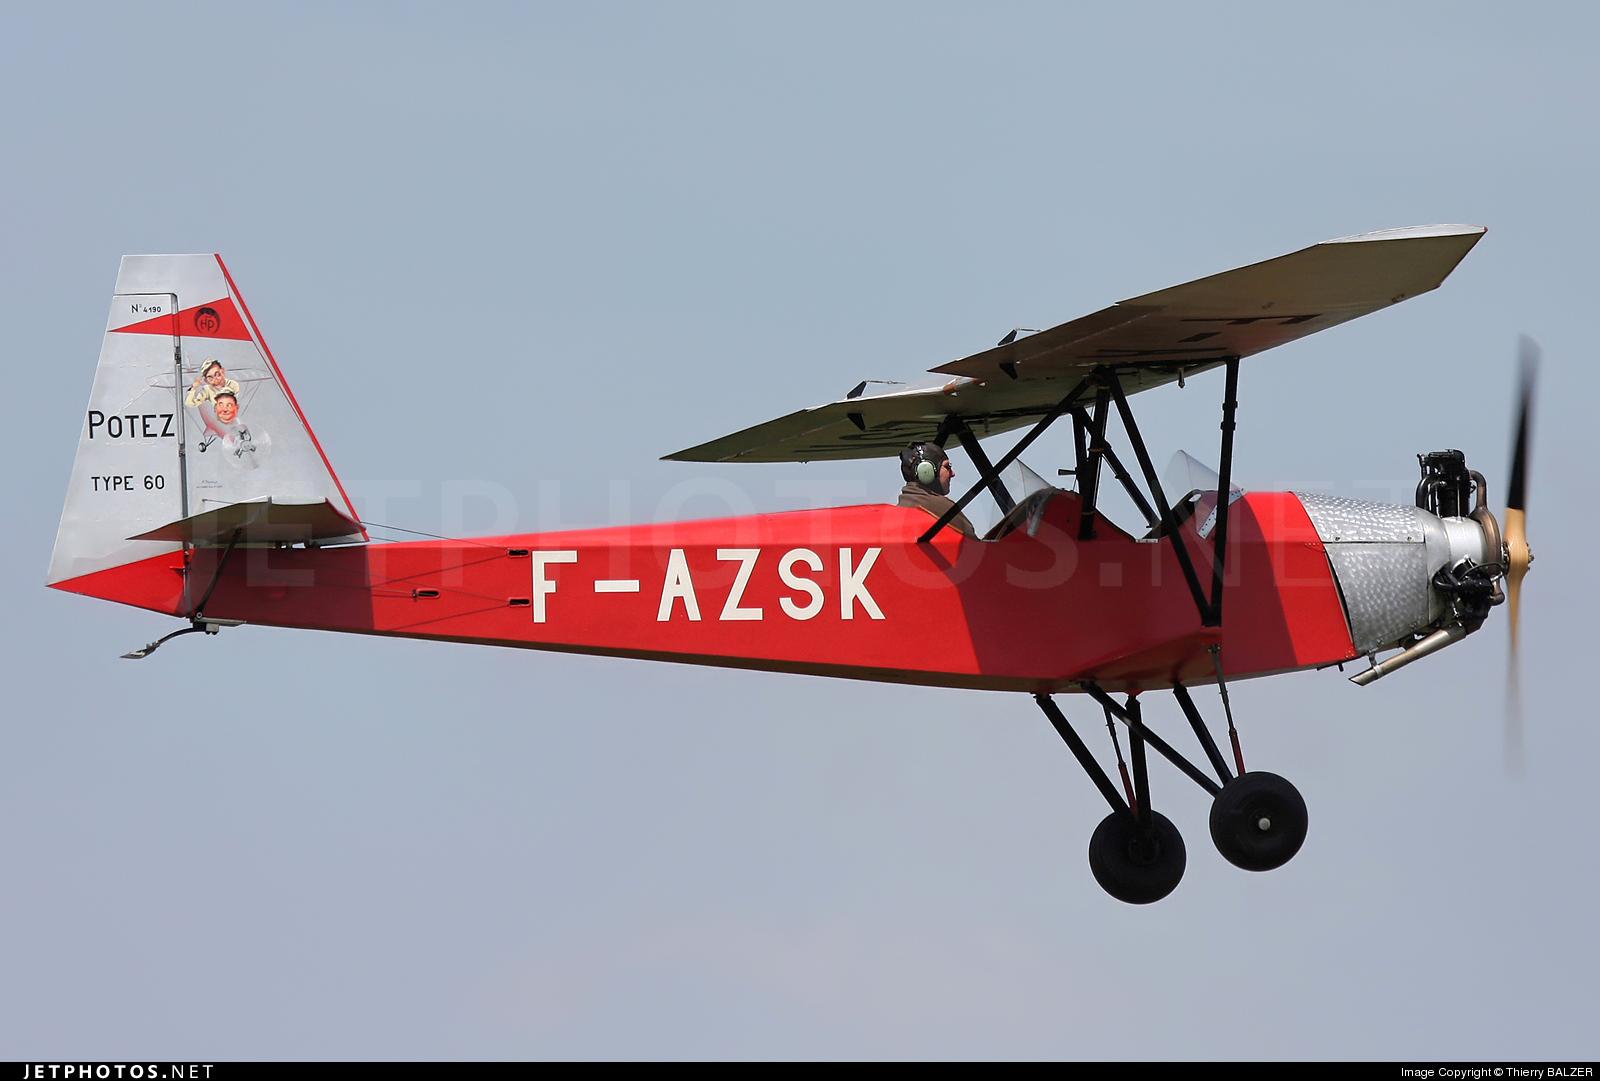 F-AZSK - Potez 60 Sauterelle - Private